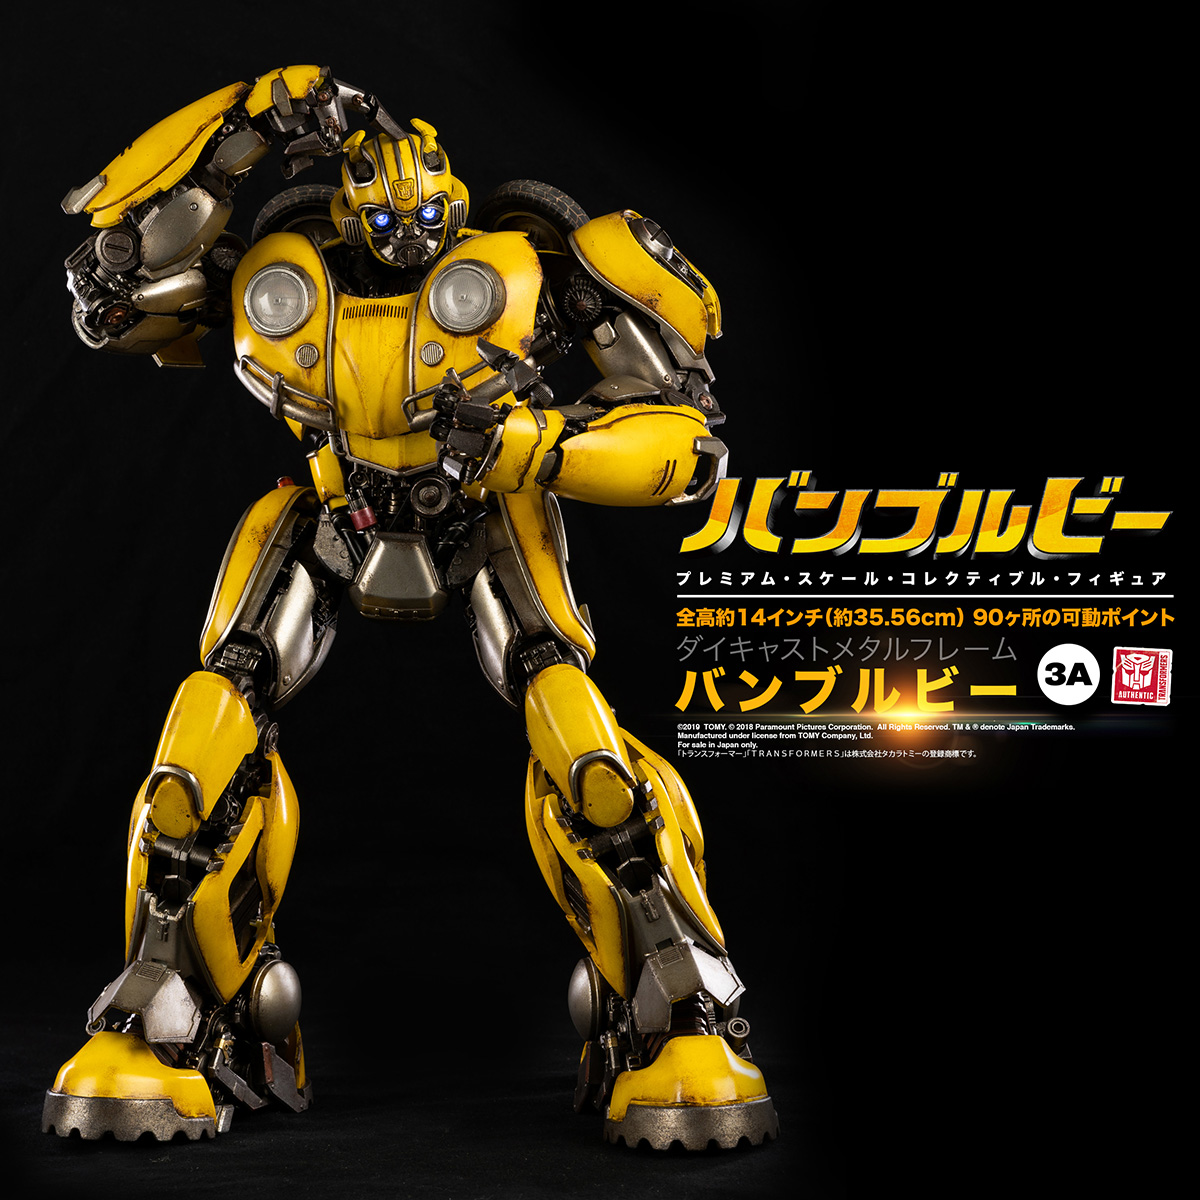 Bumblebee_JAP_PM_00096.jpg